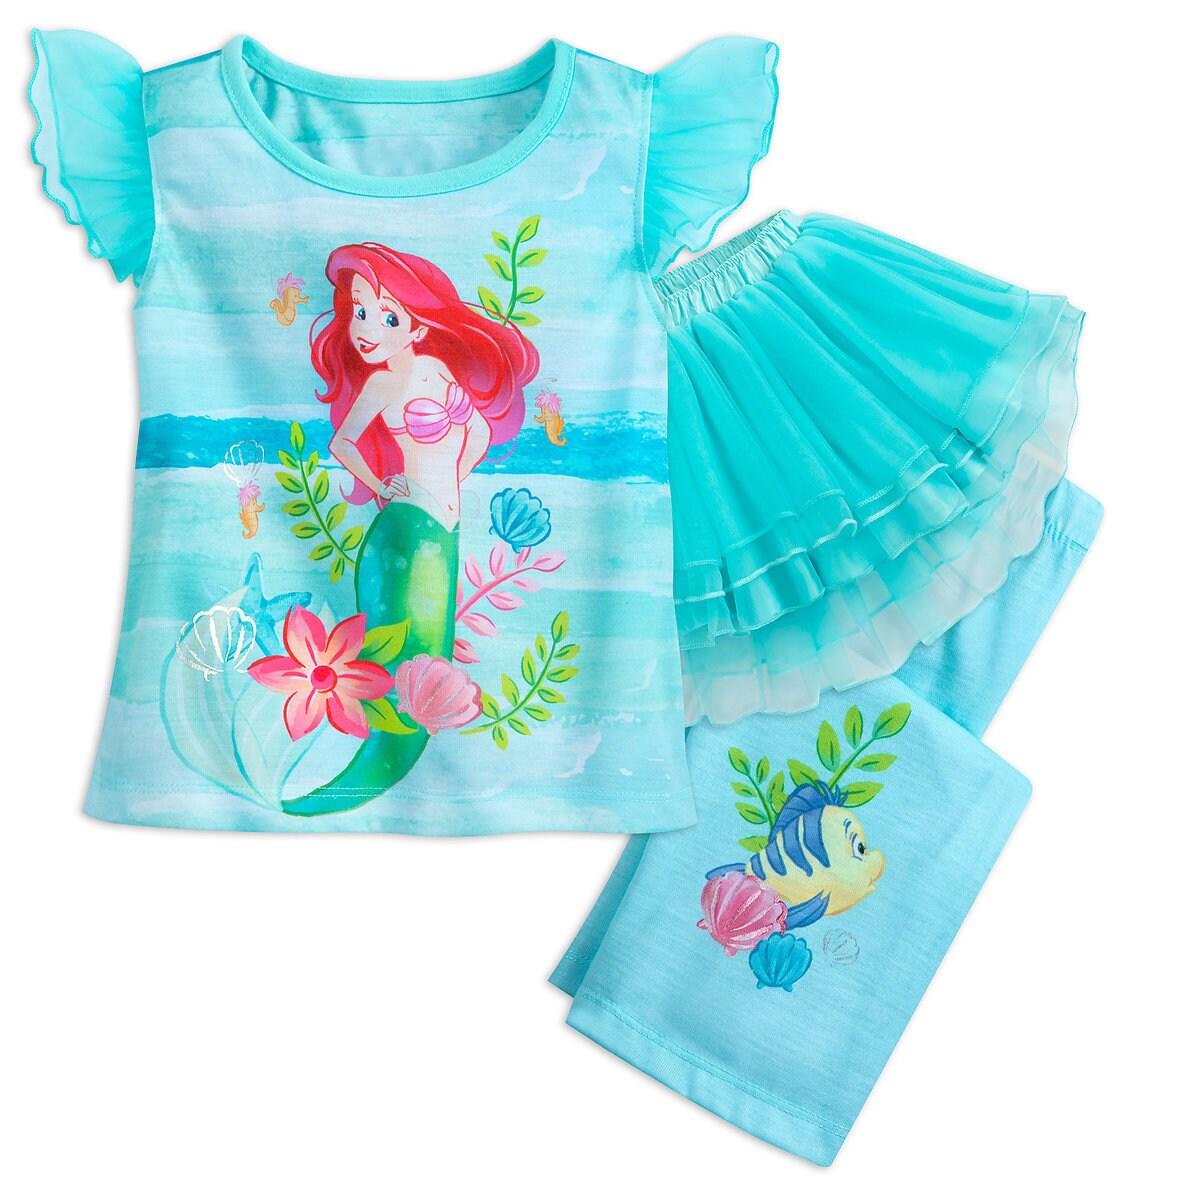 Ariel Deluxe Tutu Sleep Set for Girls | shopDisney